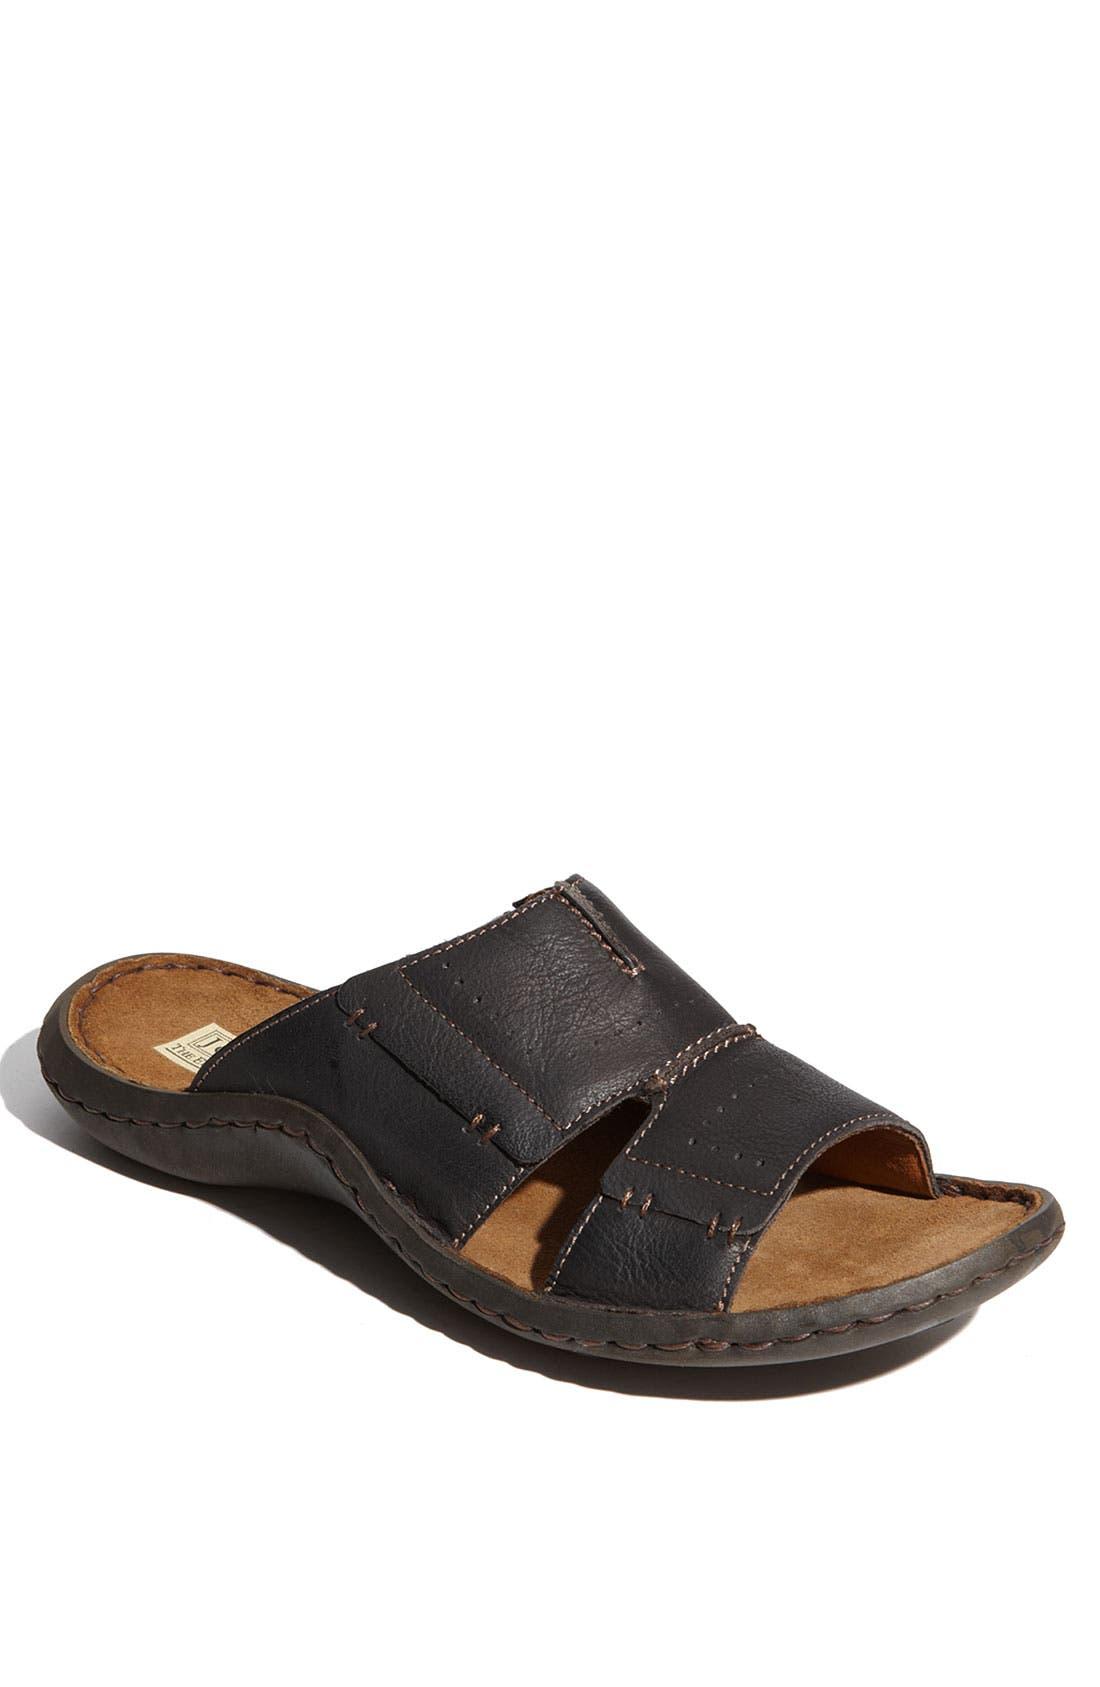 Alternate Image 1 Selected - Josef Seibel 'Larry' Slide Sandal